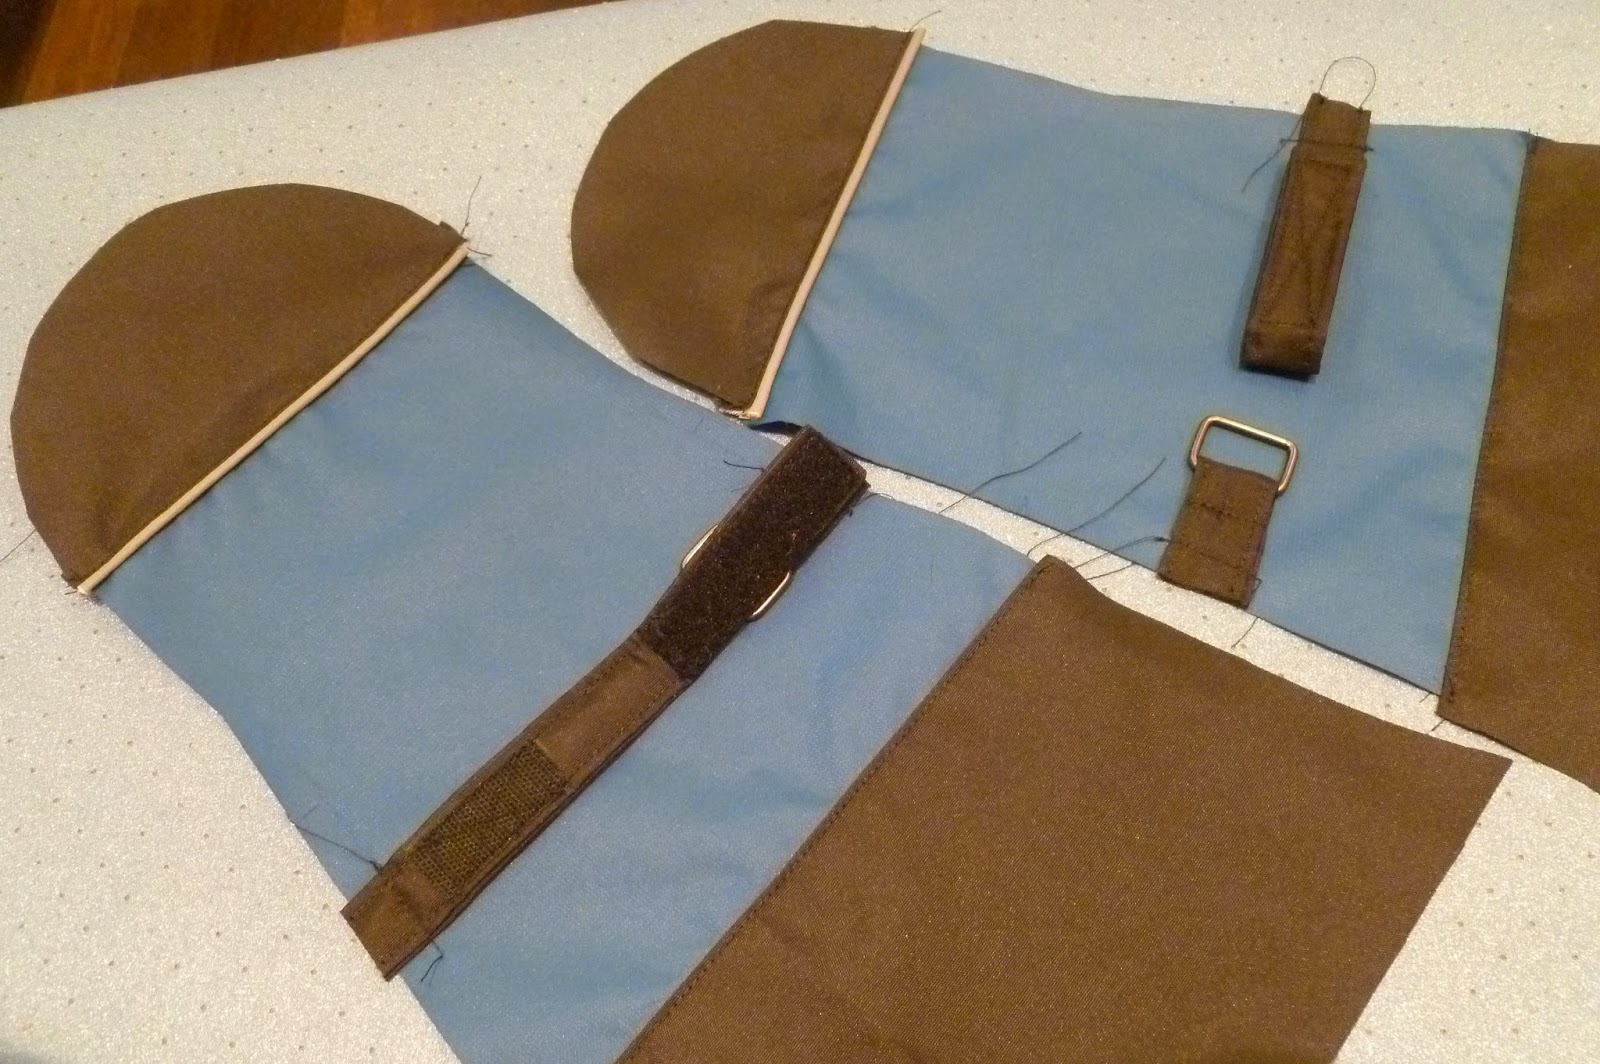 схема кармана с клапоном в простую рамку